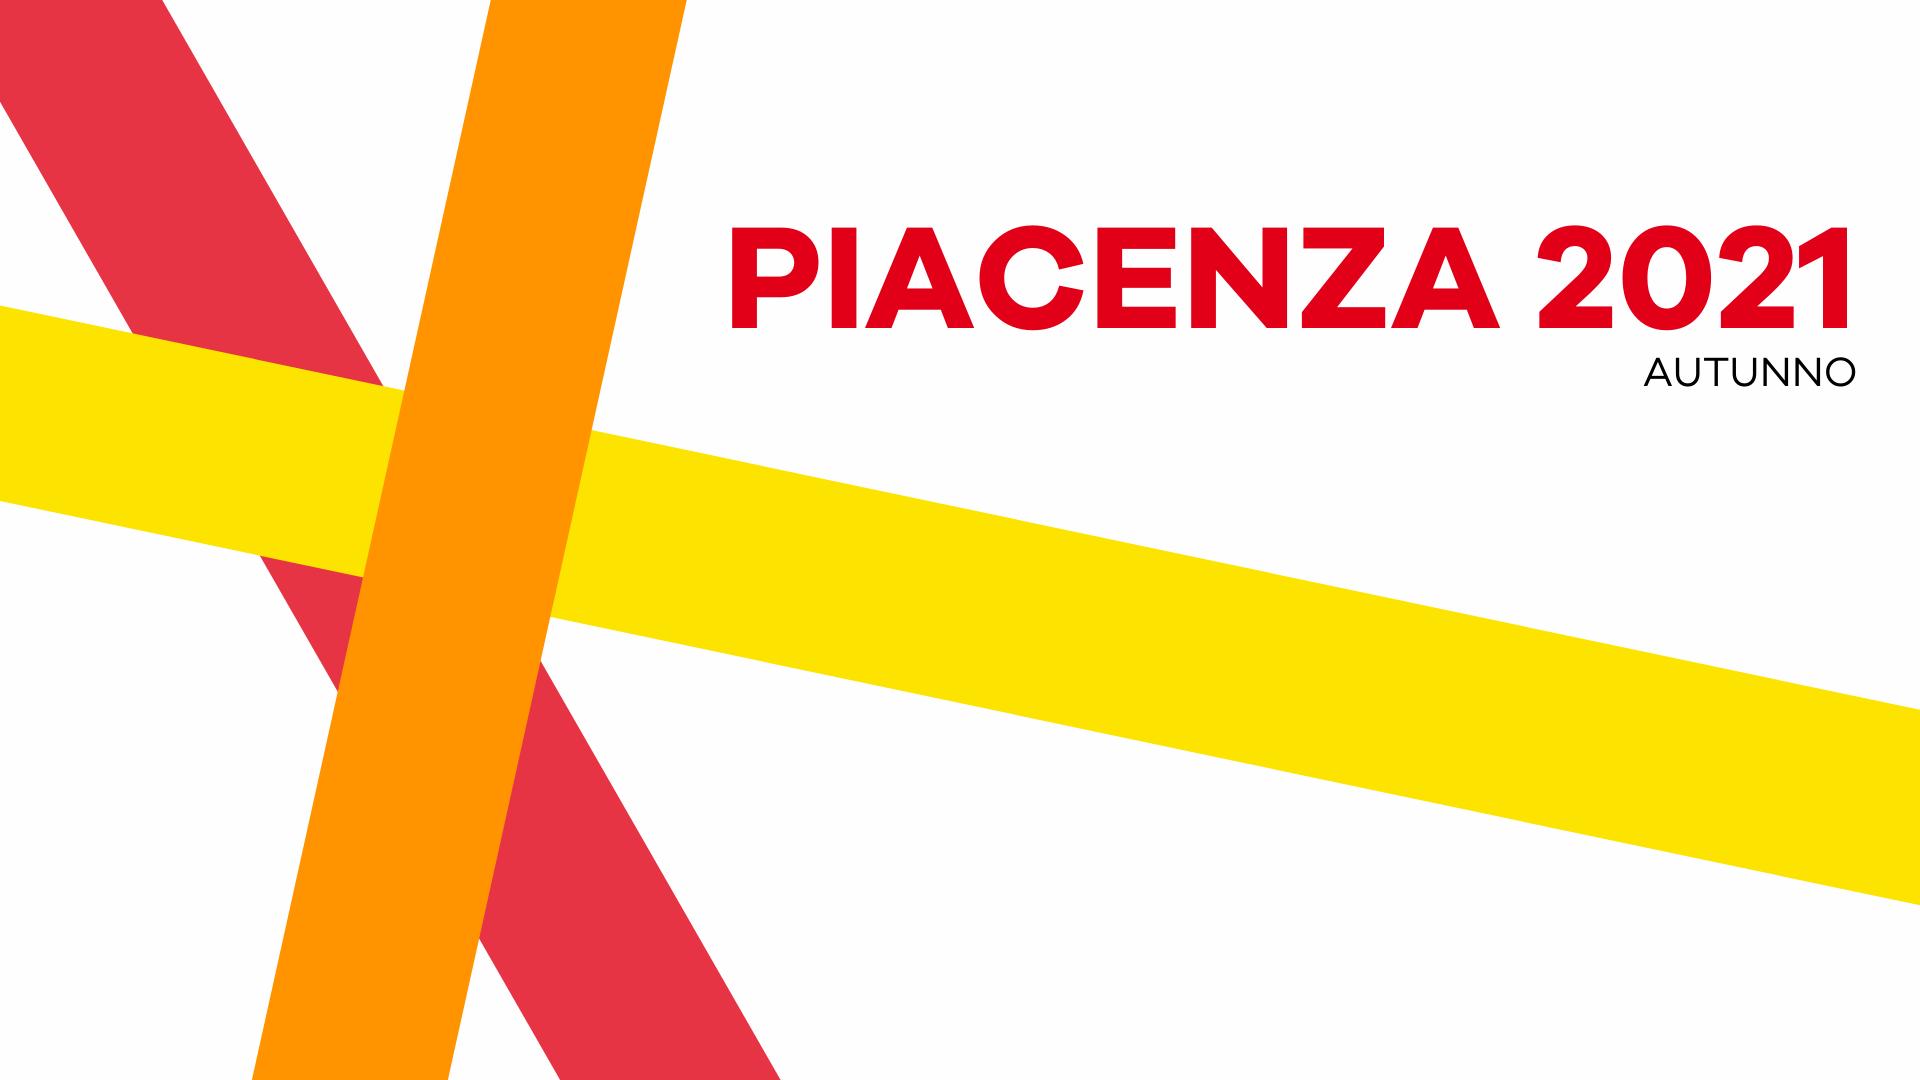 Piacenza 2021 Online